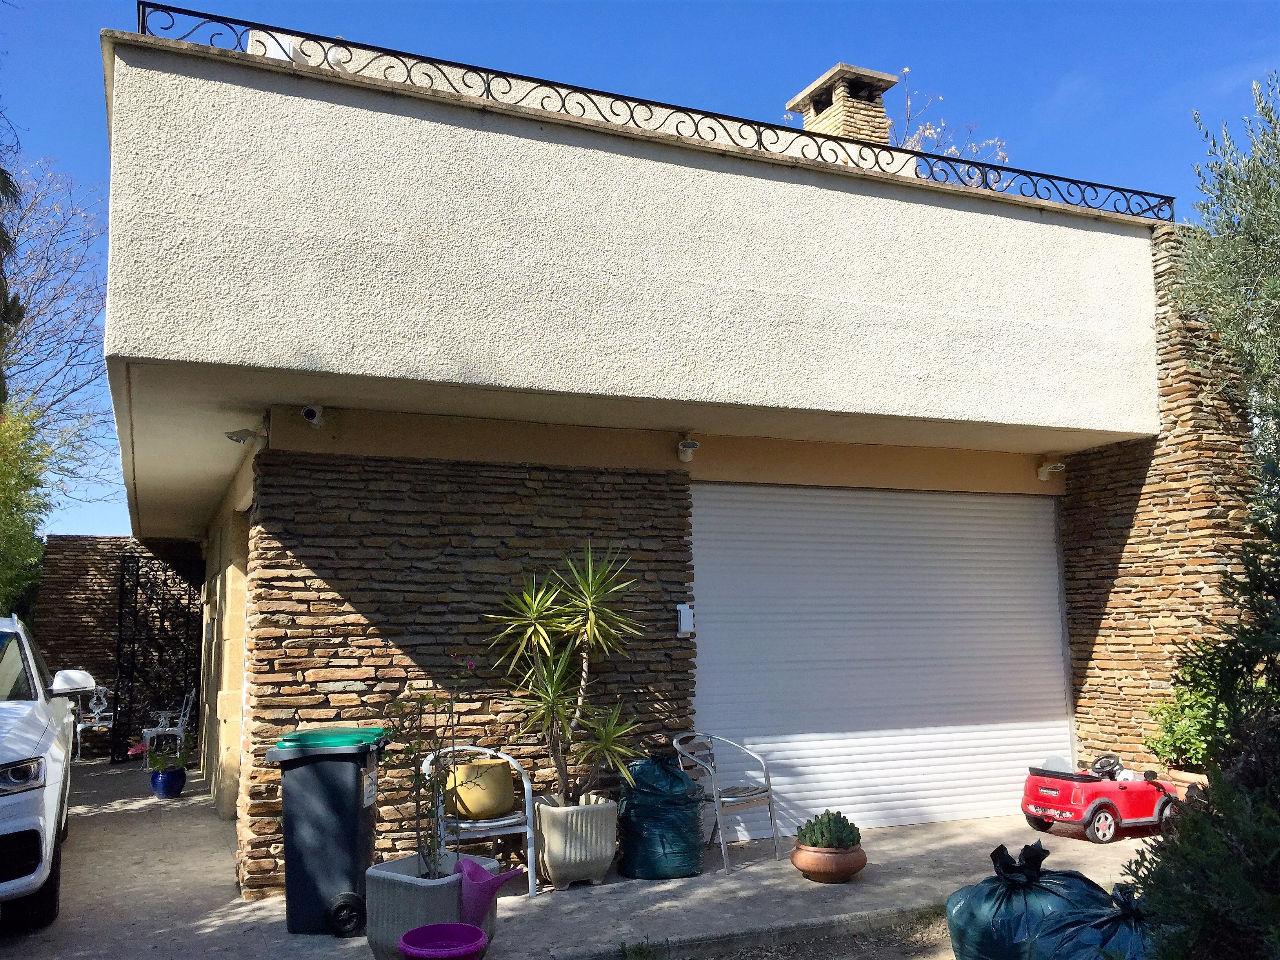 Villa piscine jardin avenue rolland garos marseille 13174 for Alarme de piscine linxor jb p 03